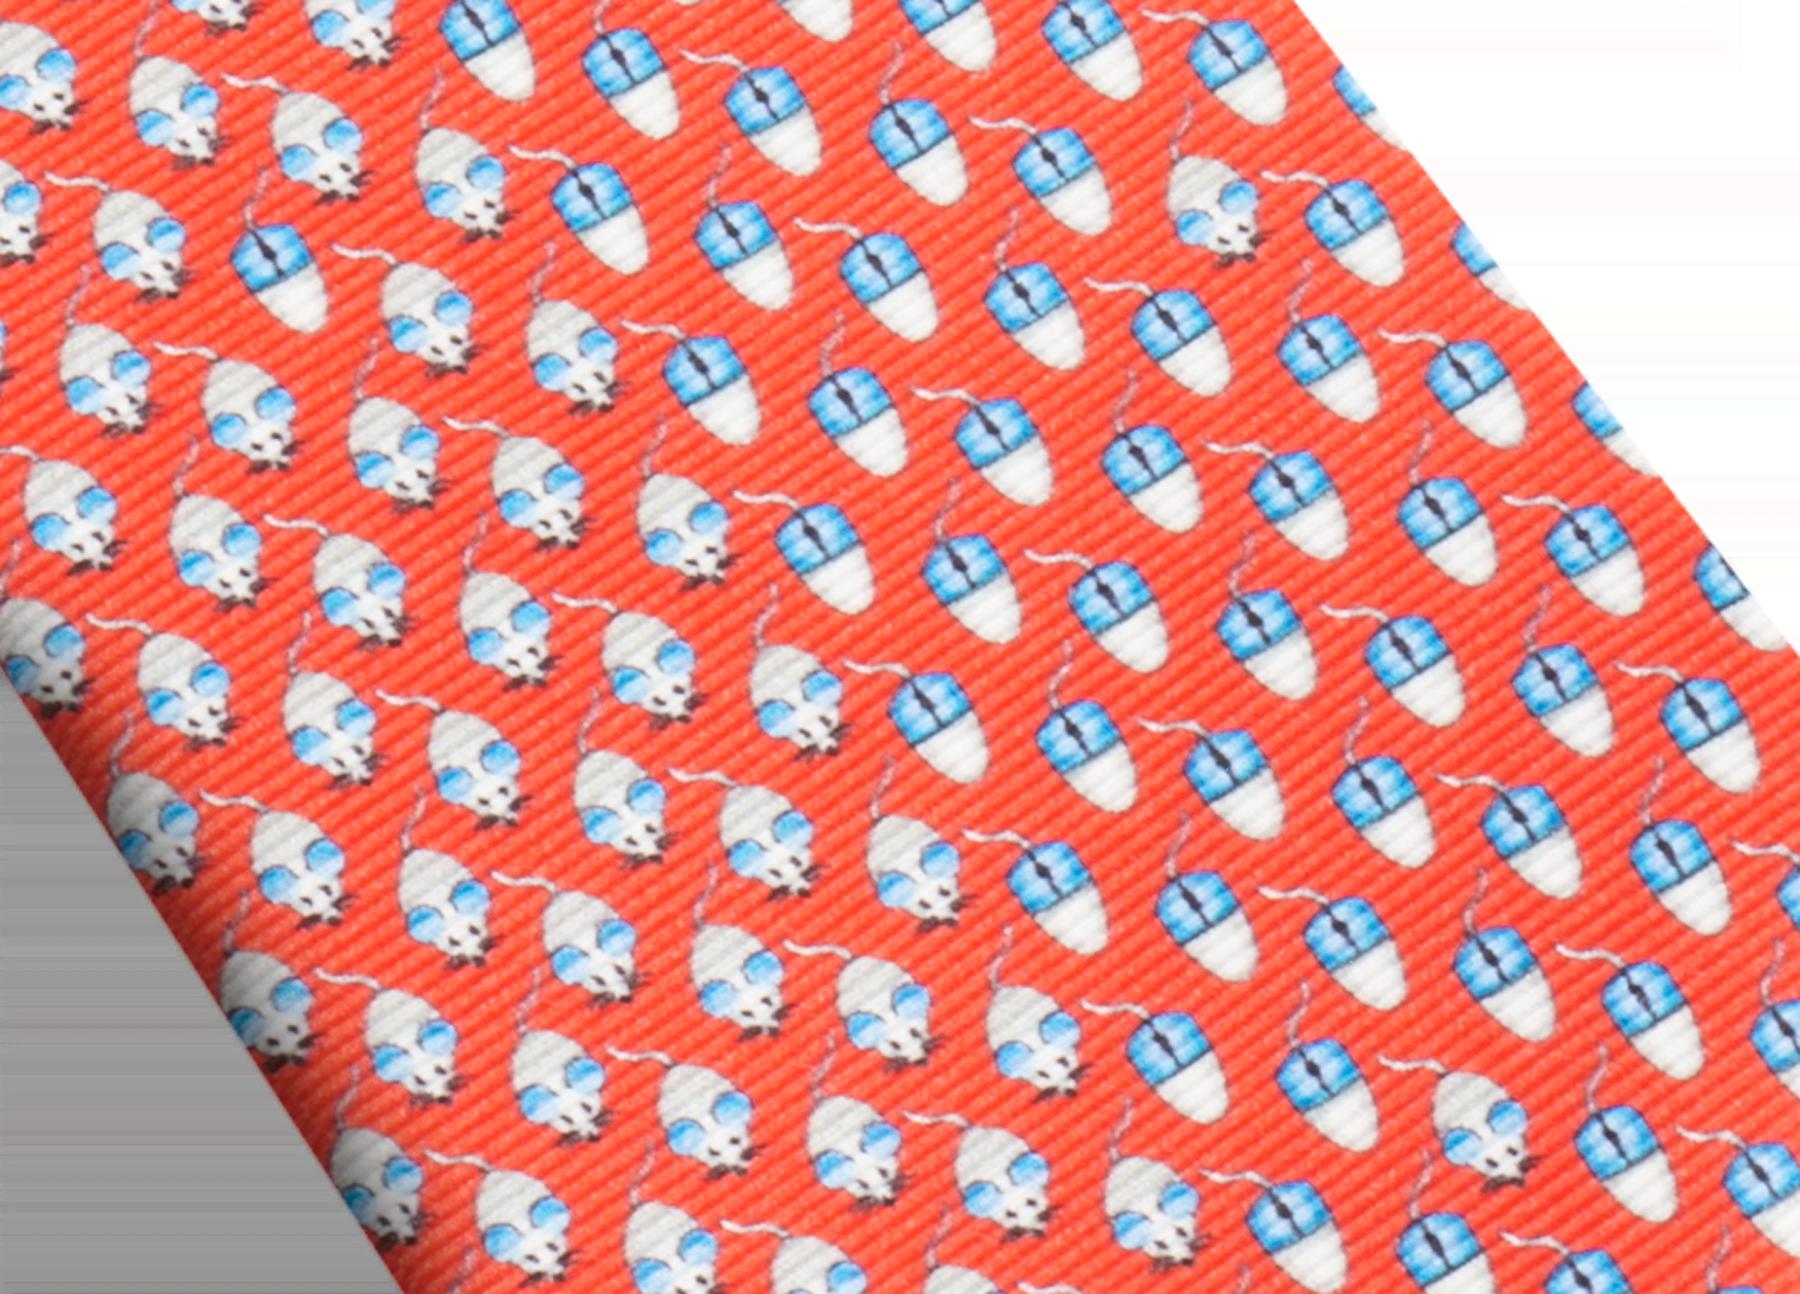 """Mouse Click"" 세븐-폴드 타이. 라일락 컬러의 고급 살리오네 프린트 실크 소재 MouseClick image 2"